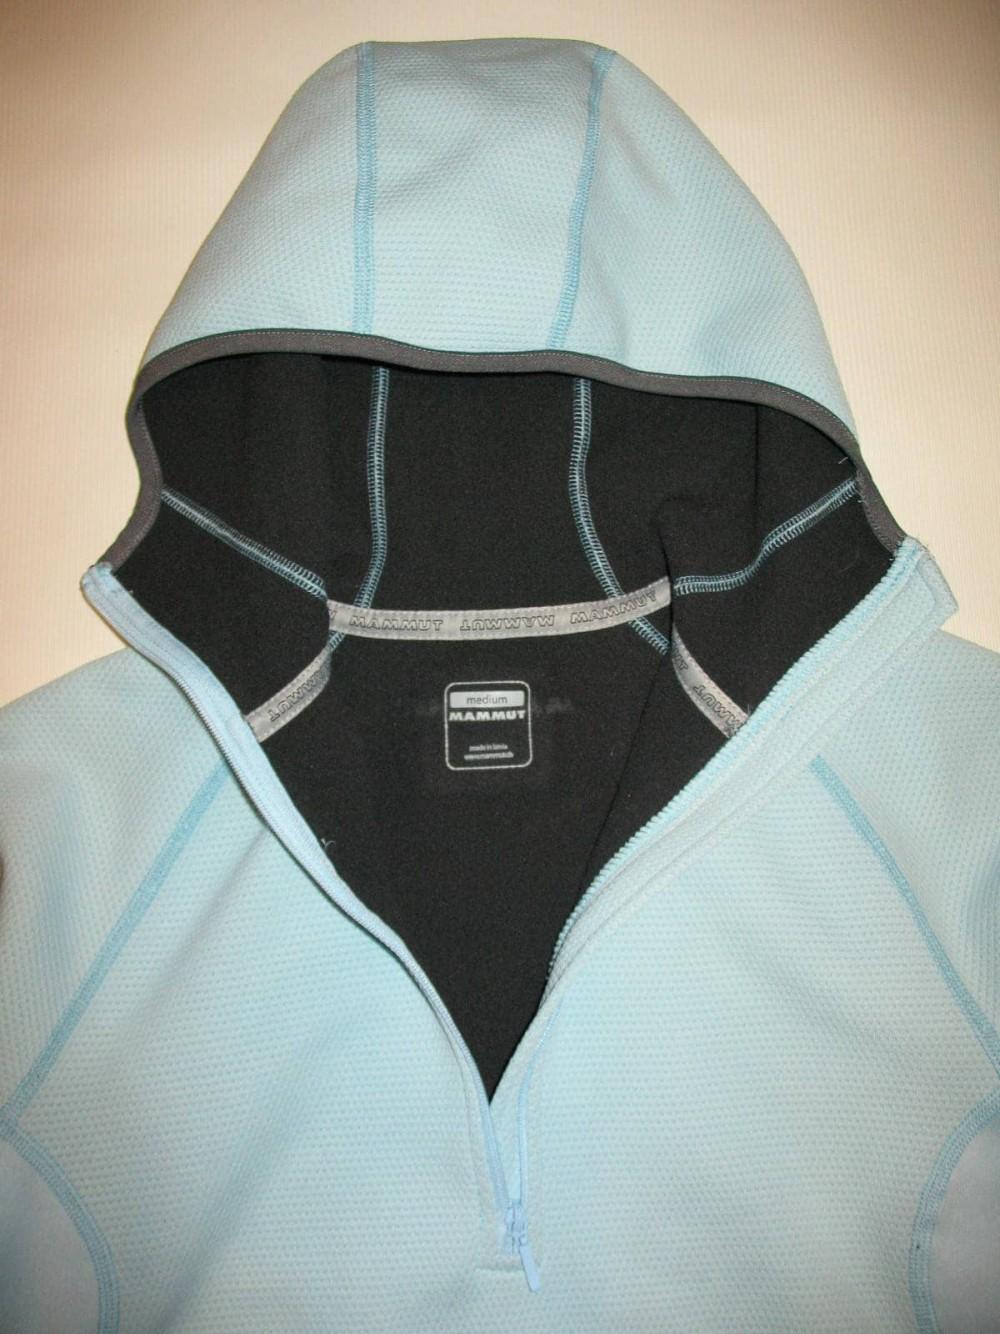 Кофта MAMMUT fleece hoodie lady (размер M) - 3